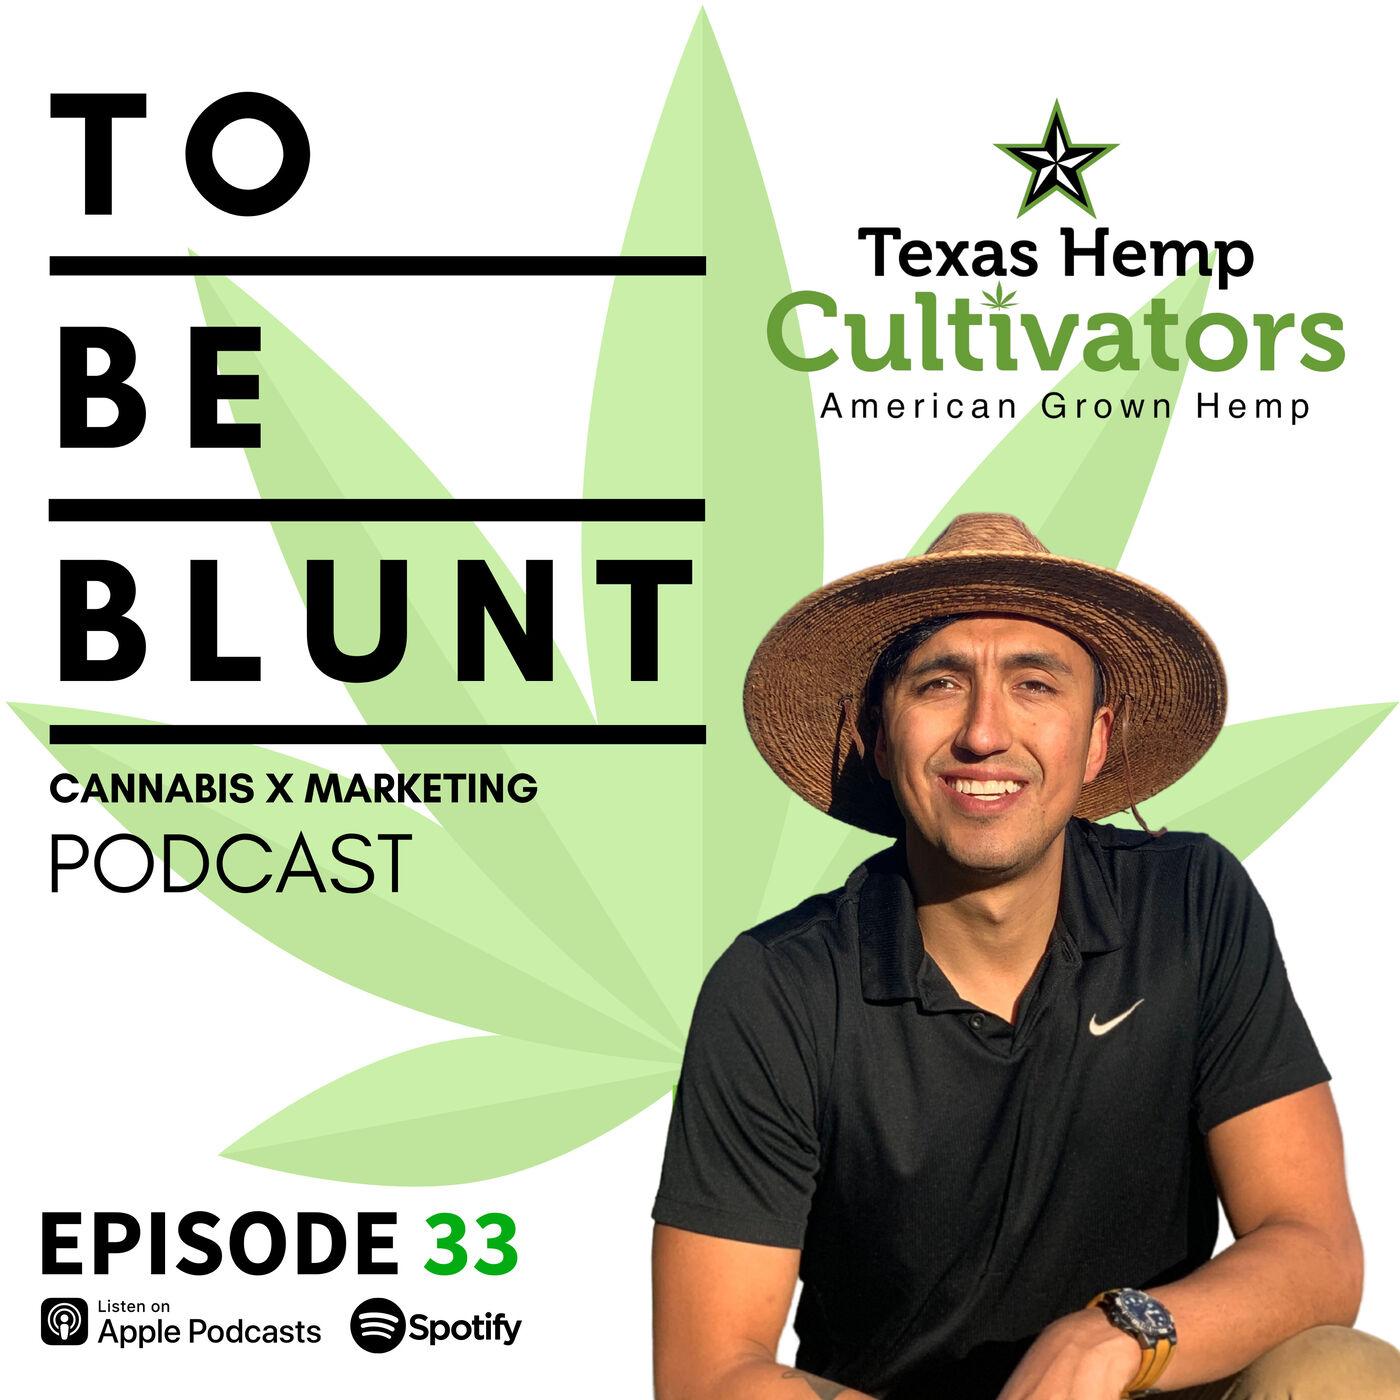 033 A higher standard: Organic Cannabis and Texas Hemp Farming with Sage Howell